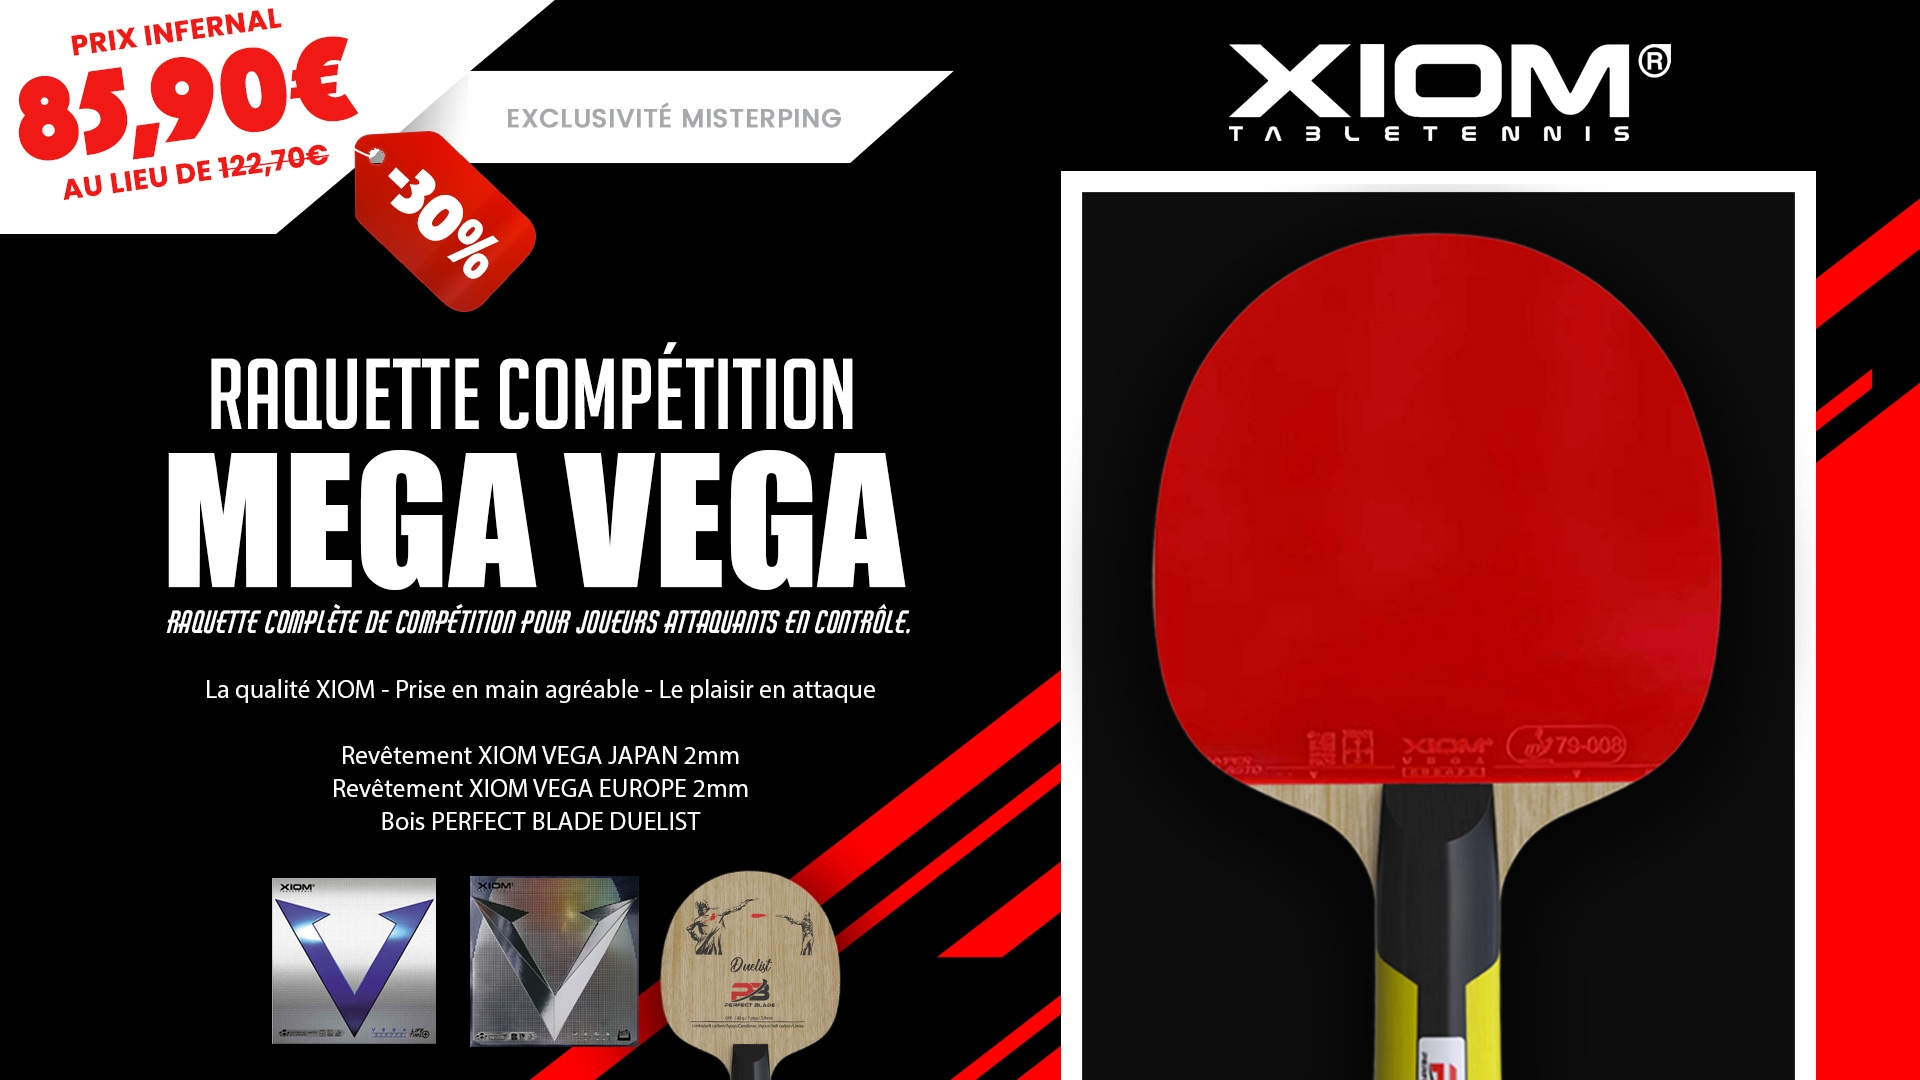 Raquette MEGA VEGA avec XIOM et PERFECT BLADE